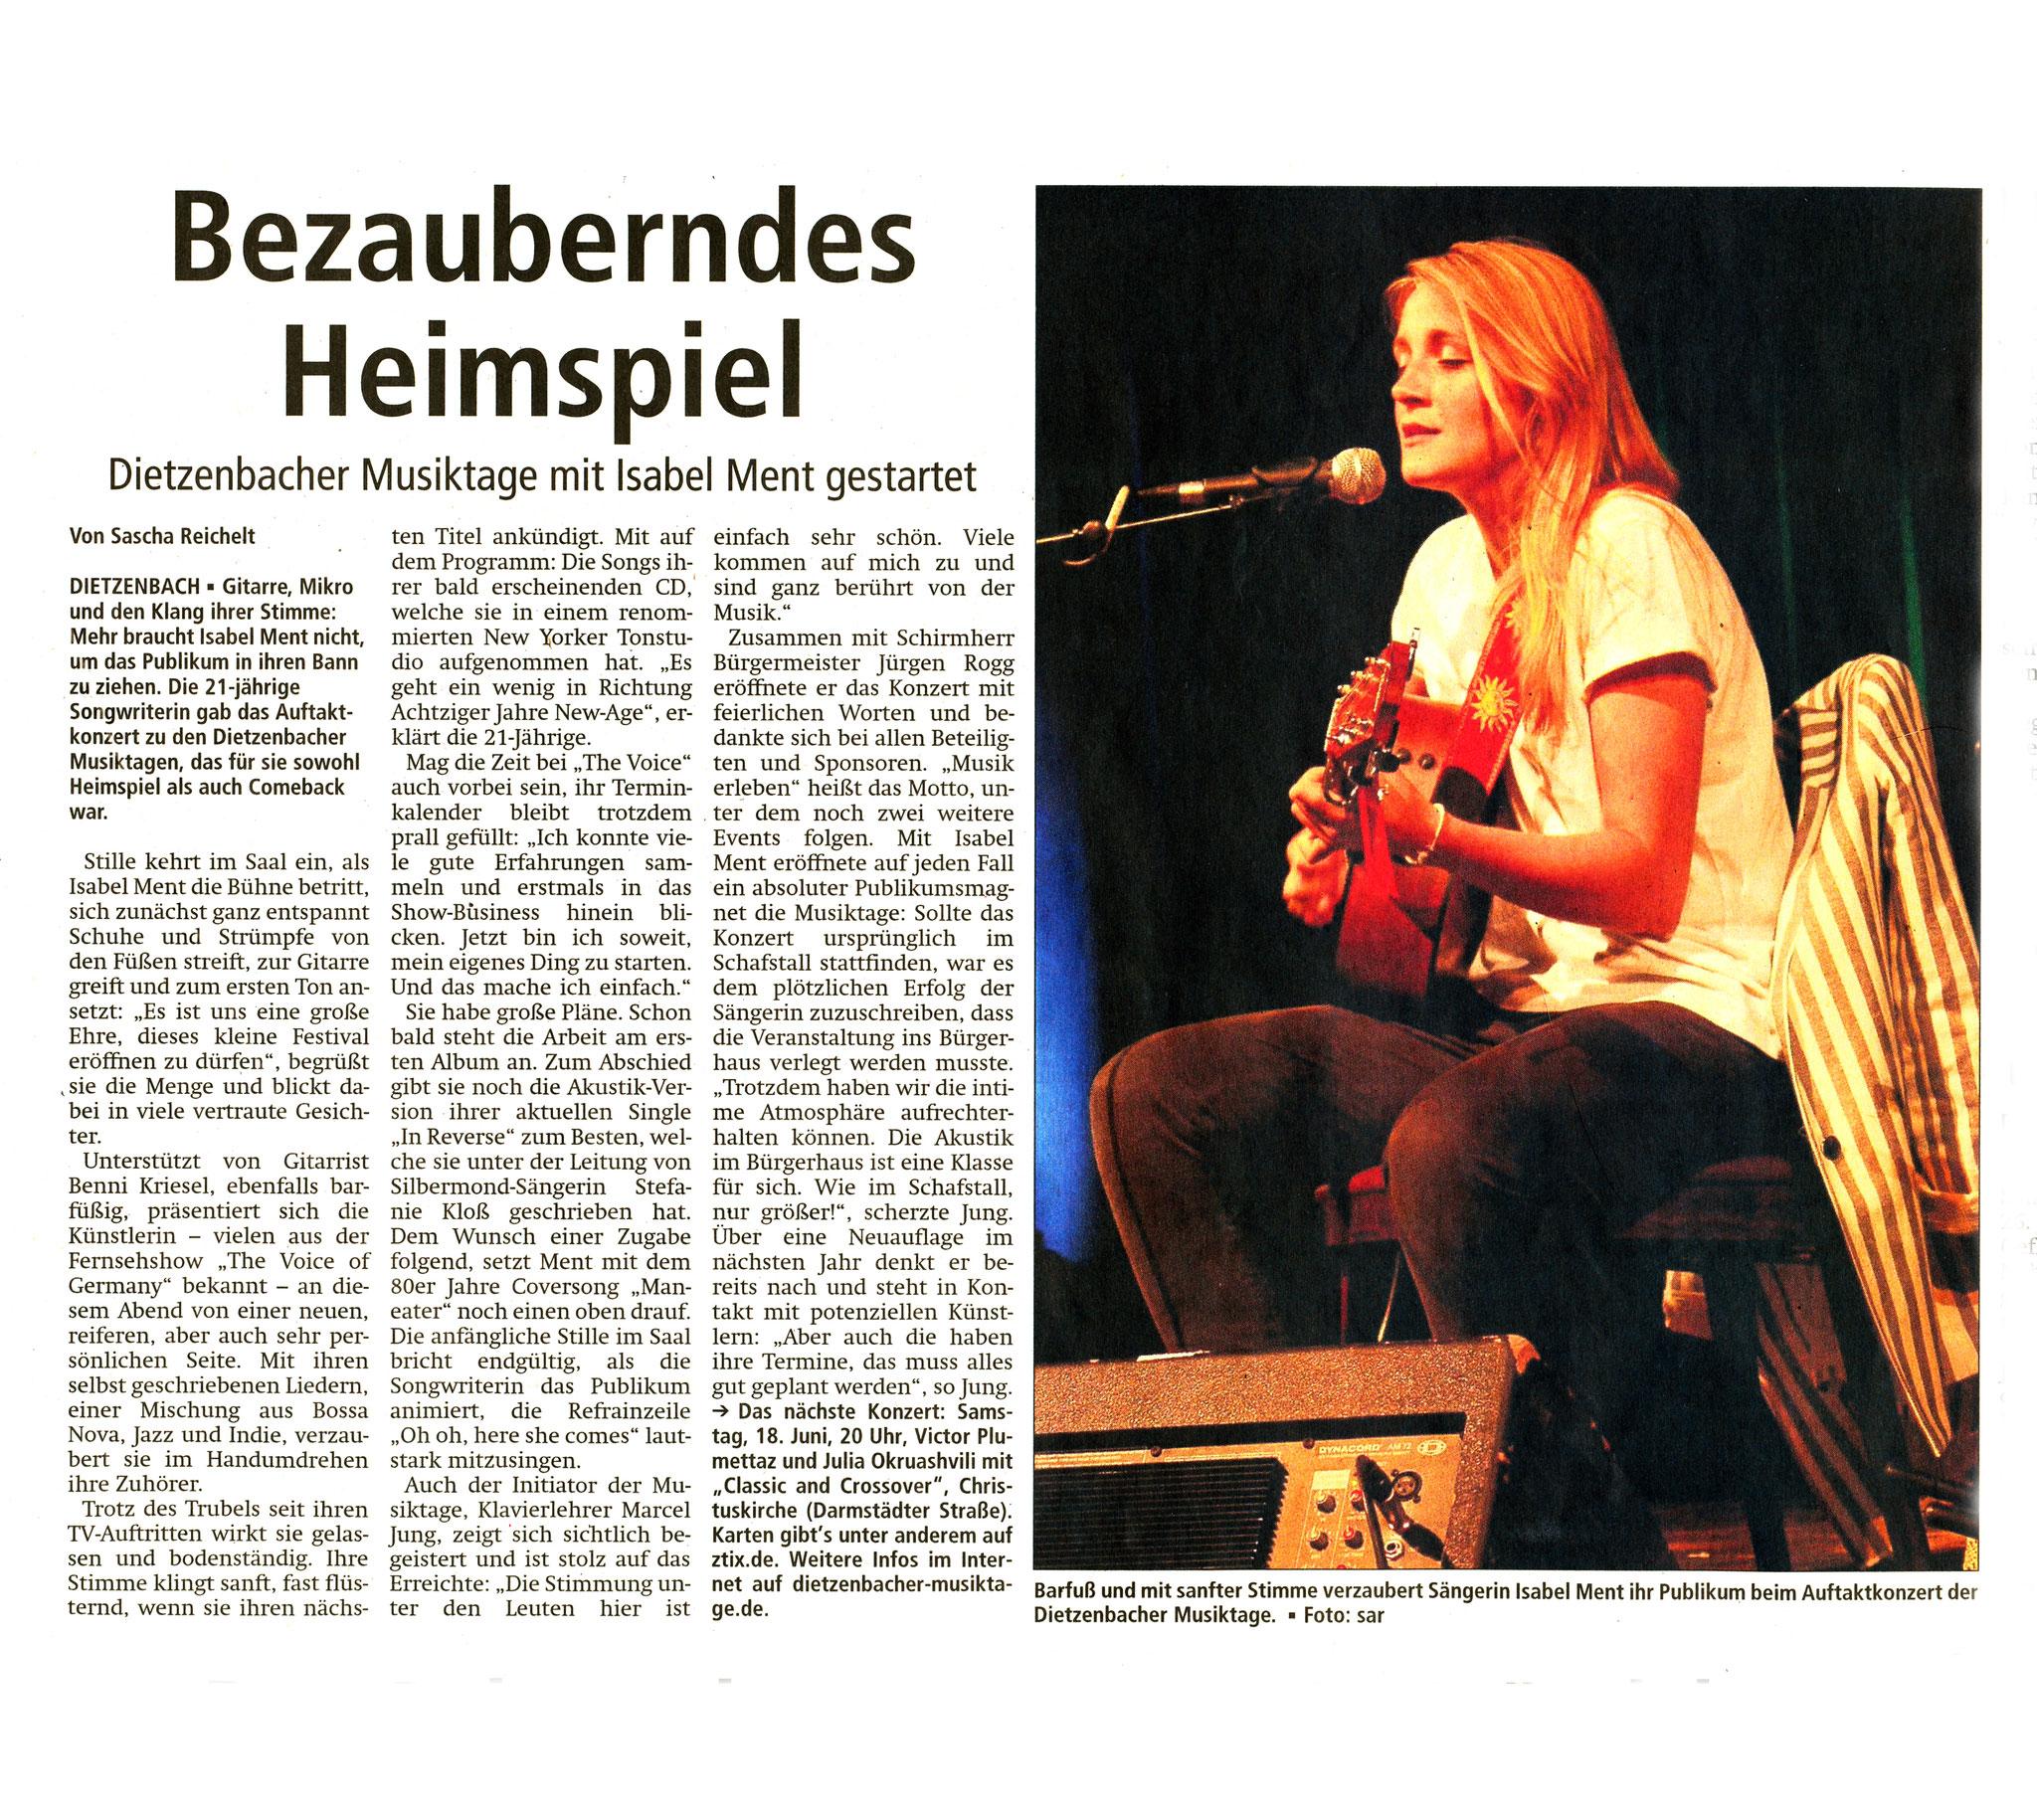 Offenbach Post, 13. Juni 2016